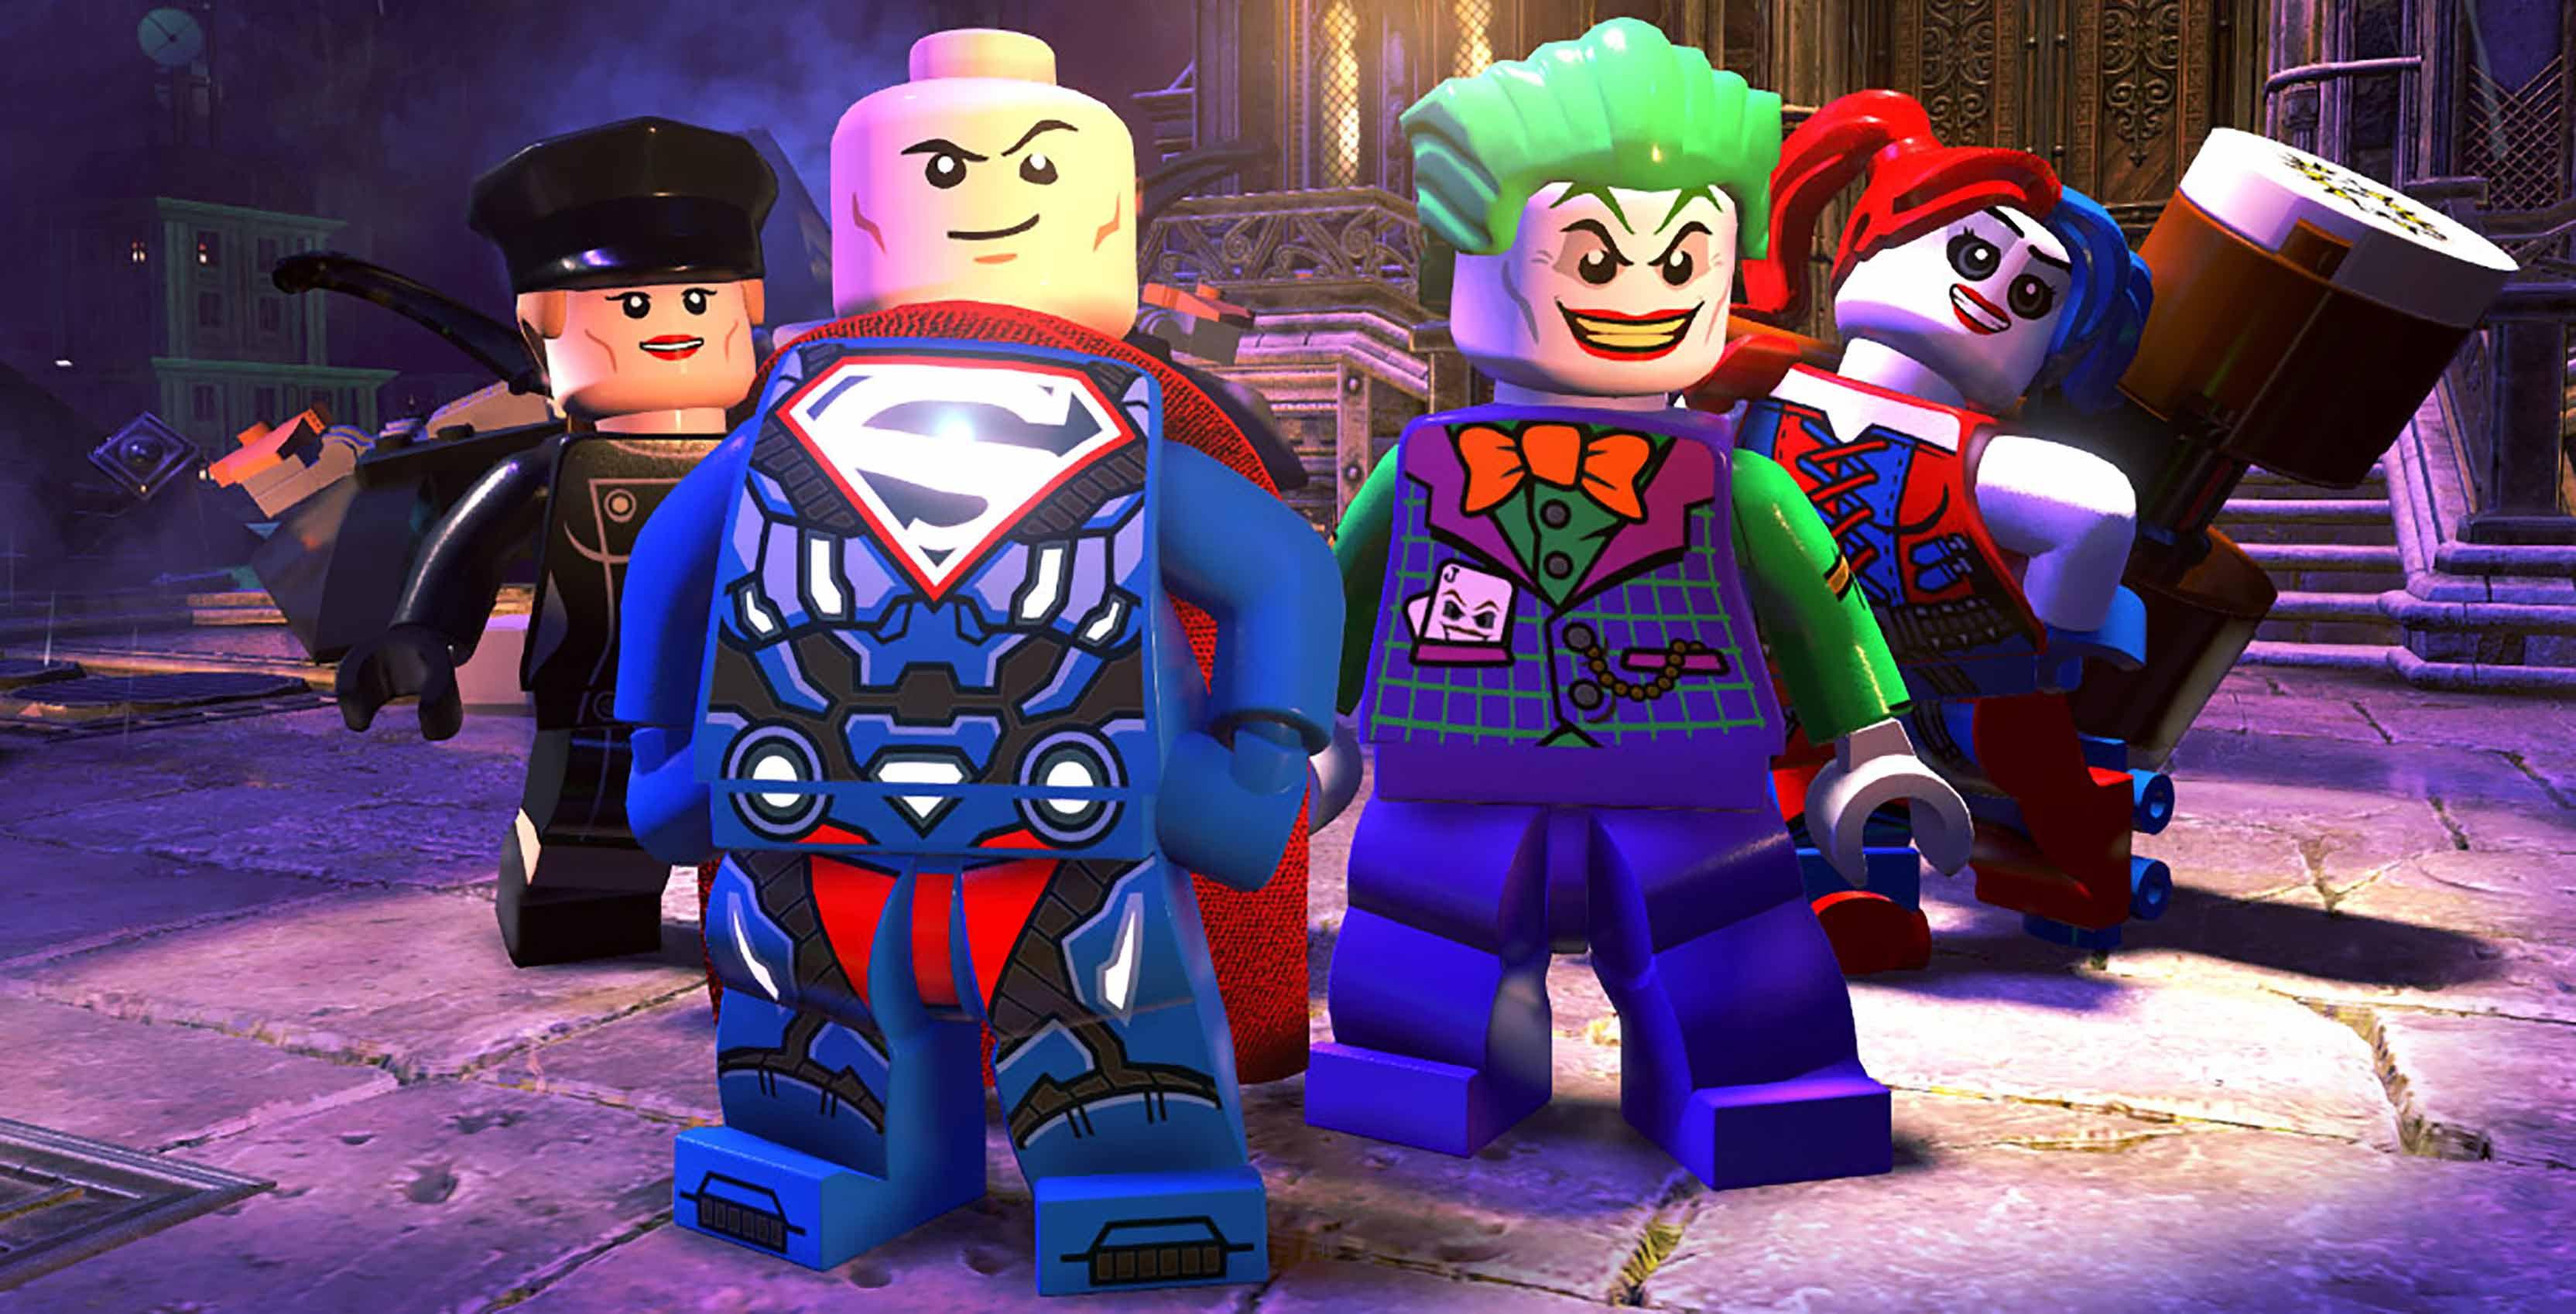 LEGO Kingdom Hearts formula games